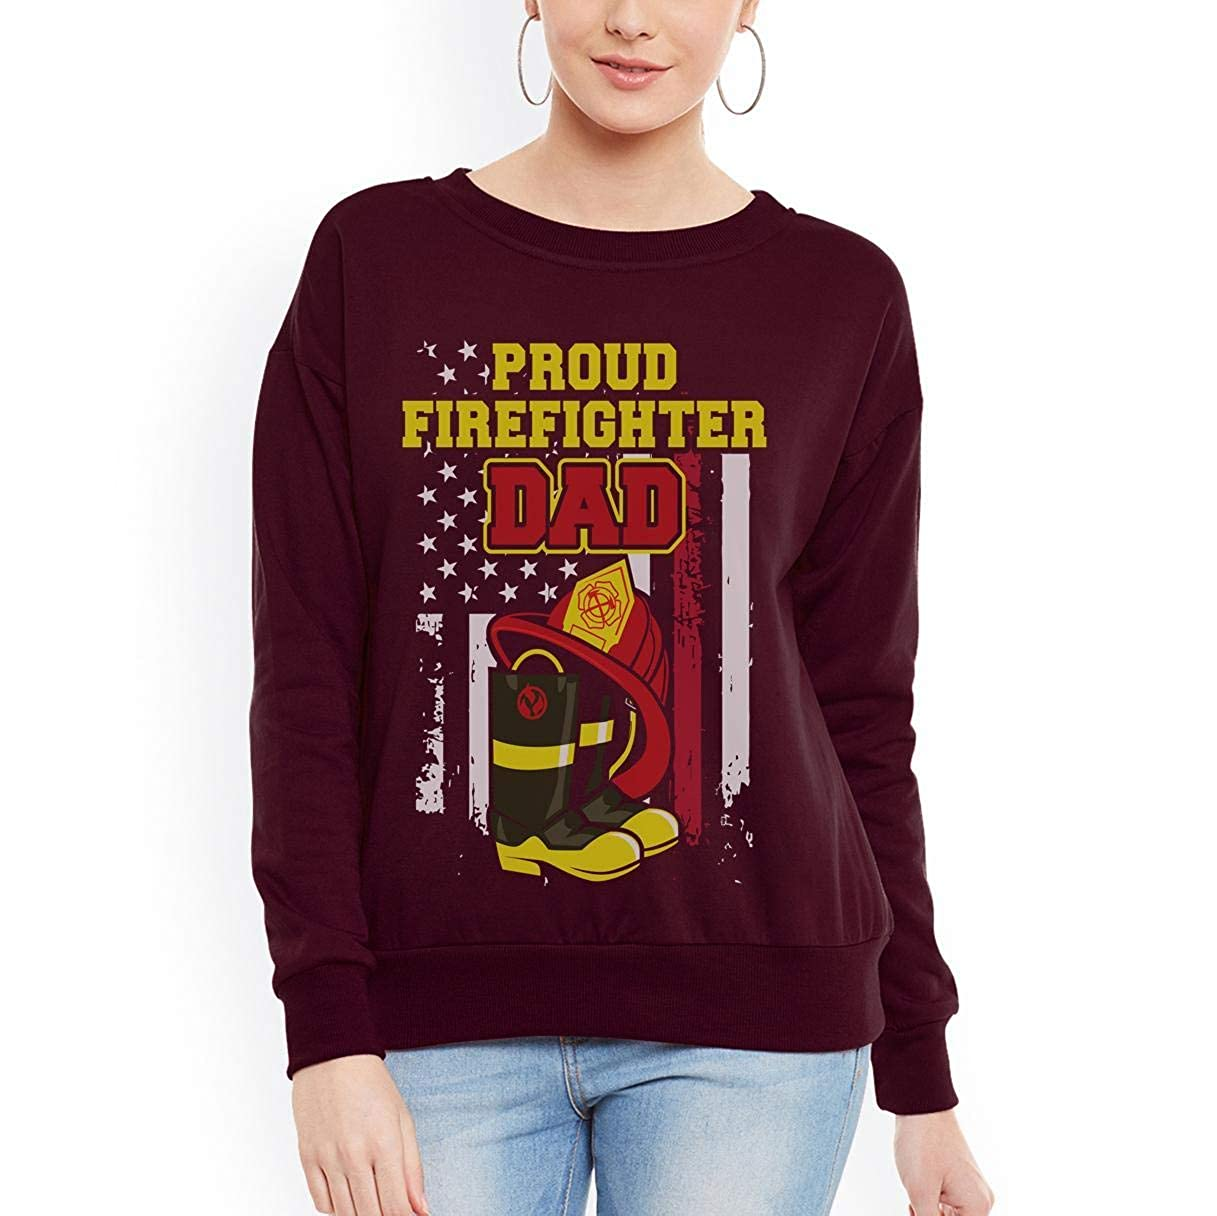 Firefighter Dad Proud Thin Red Line Father Women Sweatshirt tee